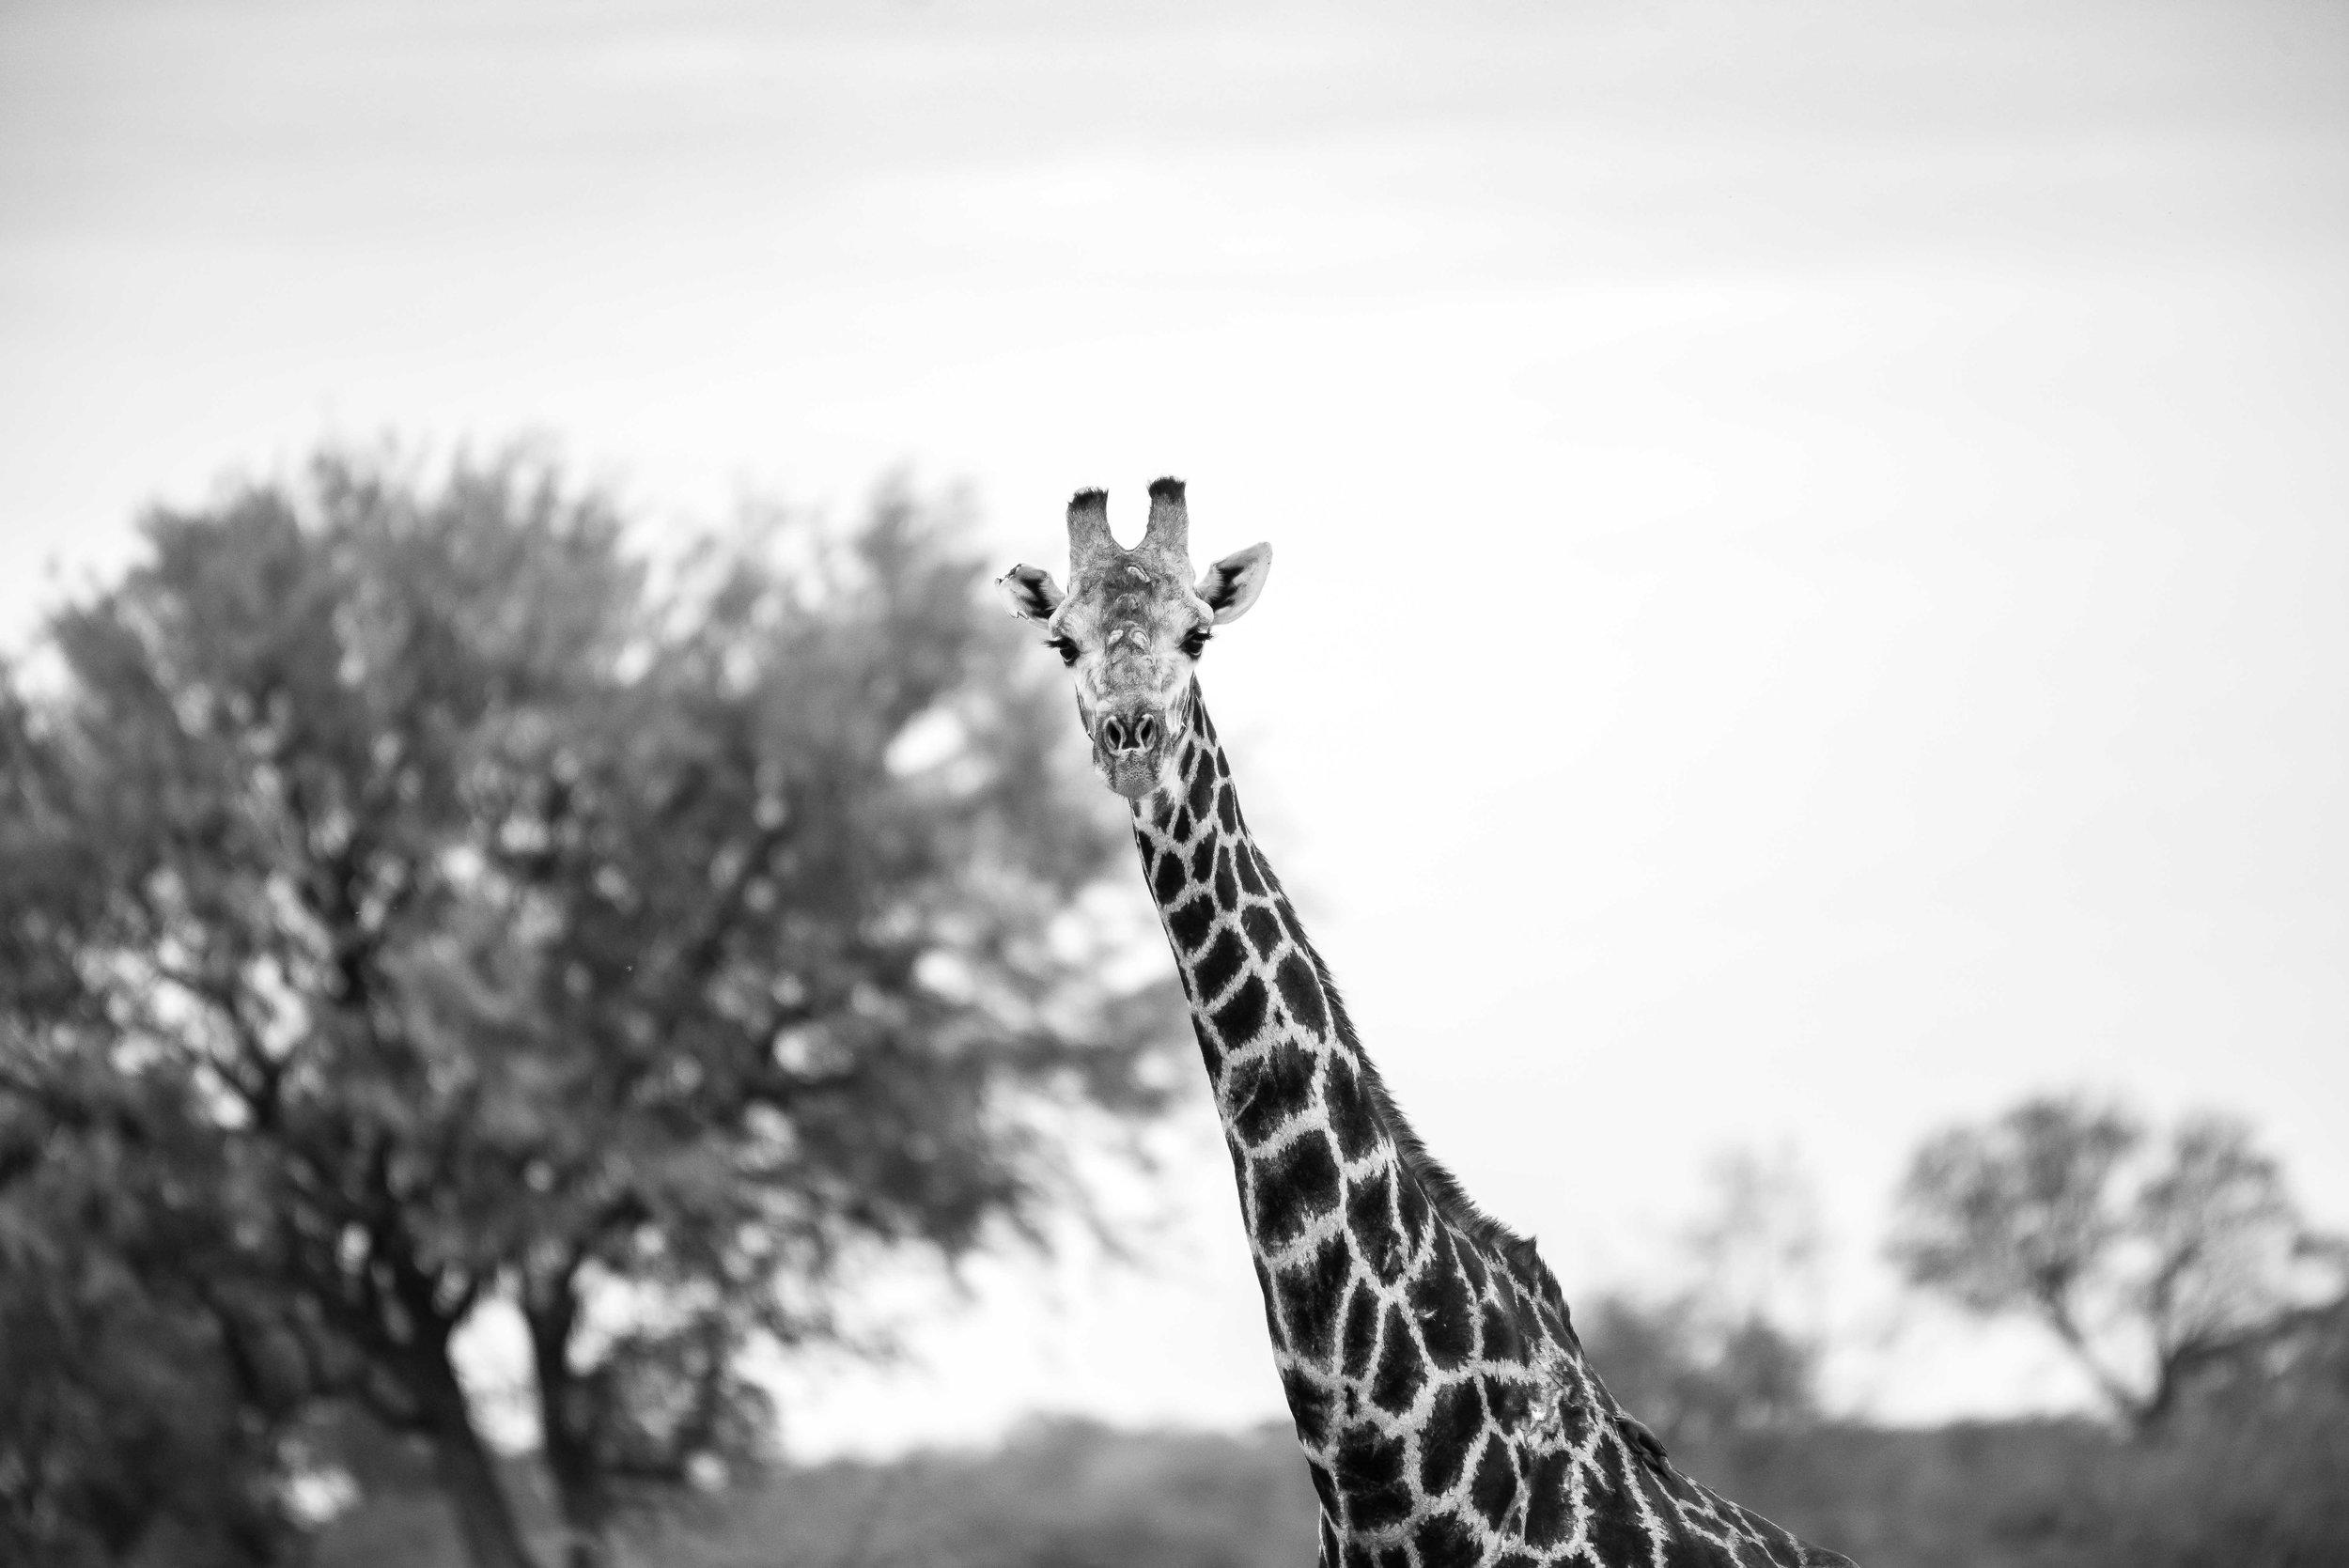 Erin-Fabio-Photography-Africa-2018-36.jpg